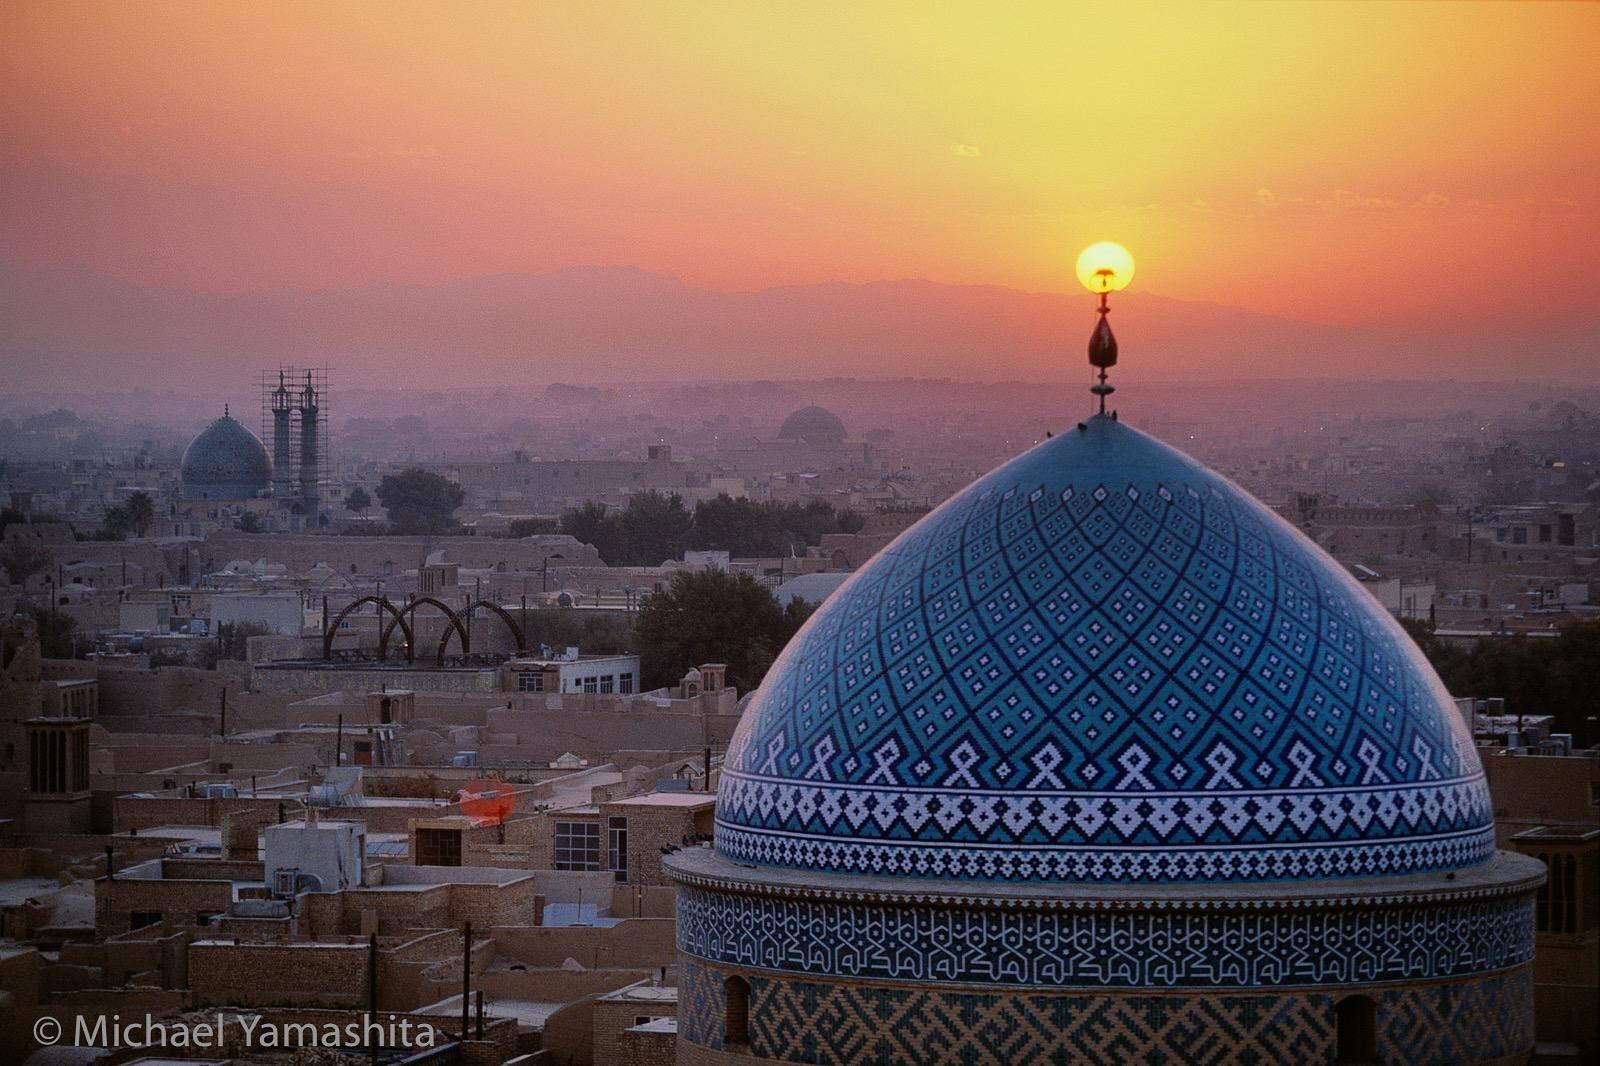 Sunset Mosque in Yazd, Iran